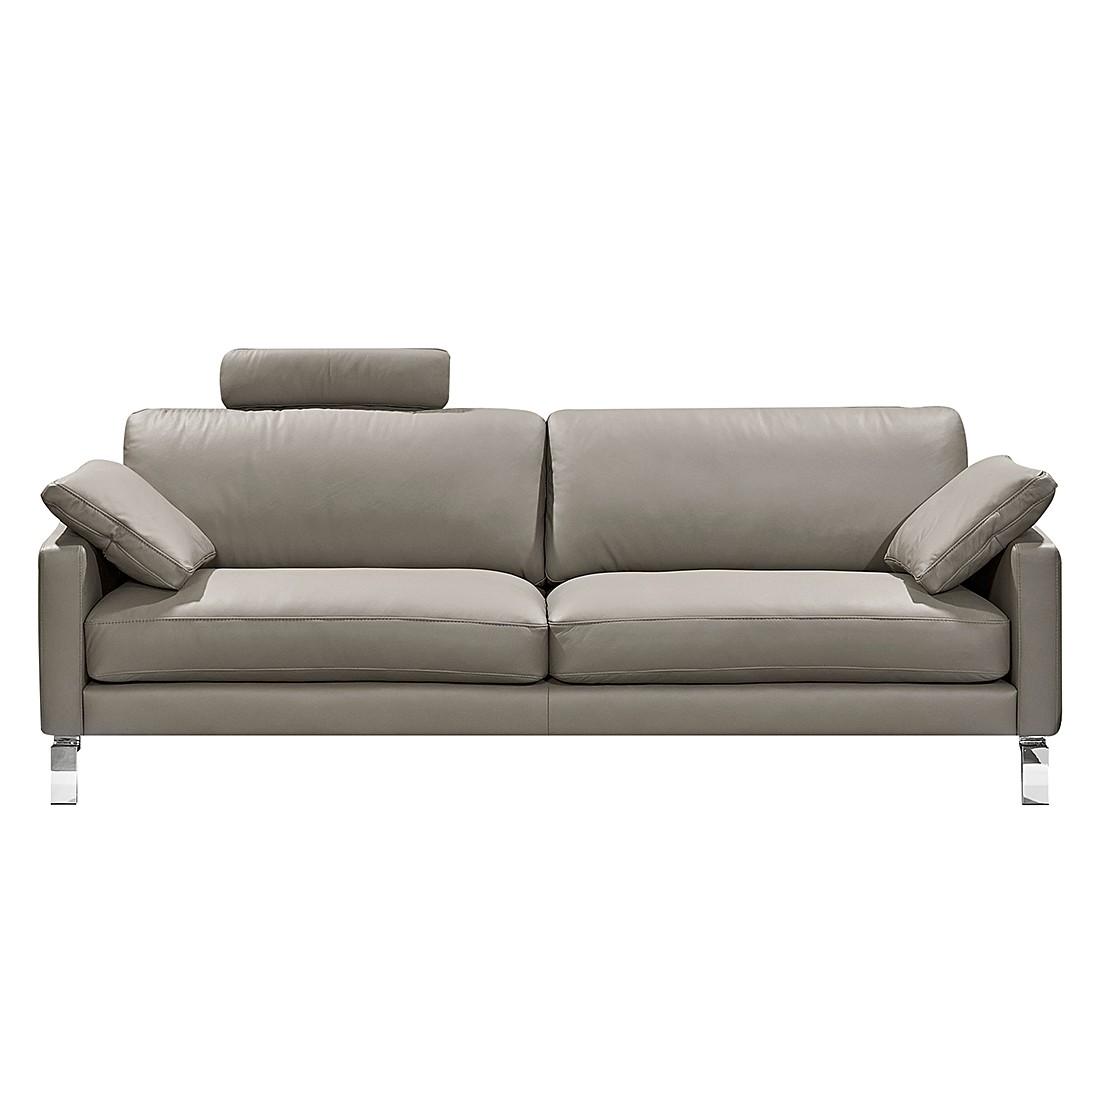 sofa casual line iv 2 5 sitzer echtleder grau gedecktes dickleder claas claasen bestellen. Black Bedroom Furniture Sets. Home Design Ideas